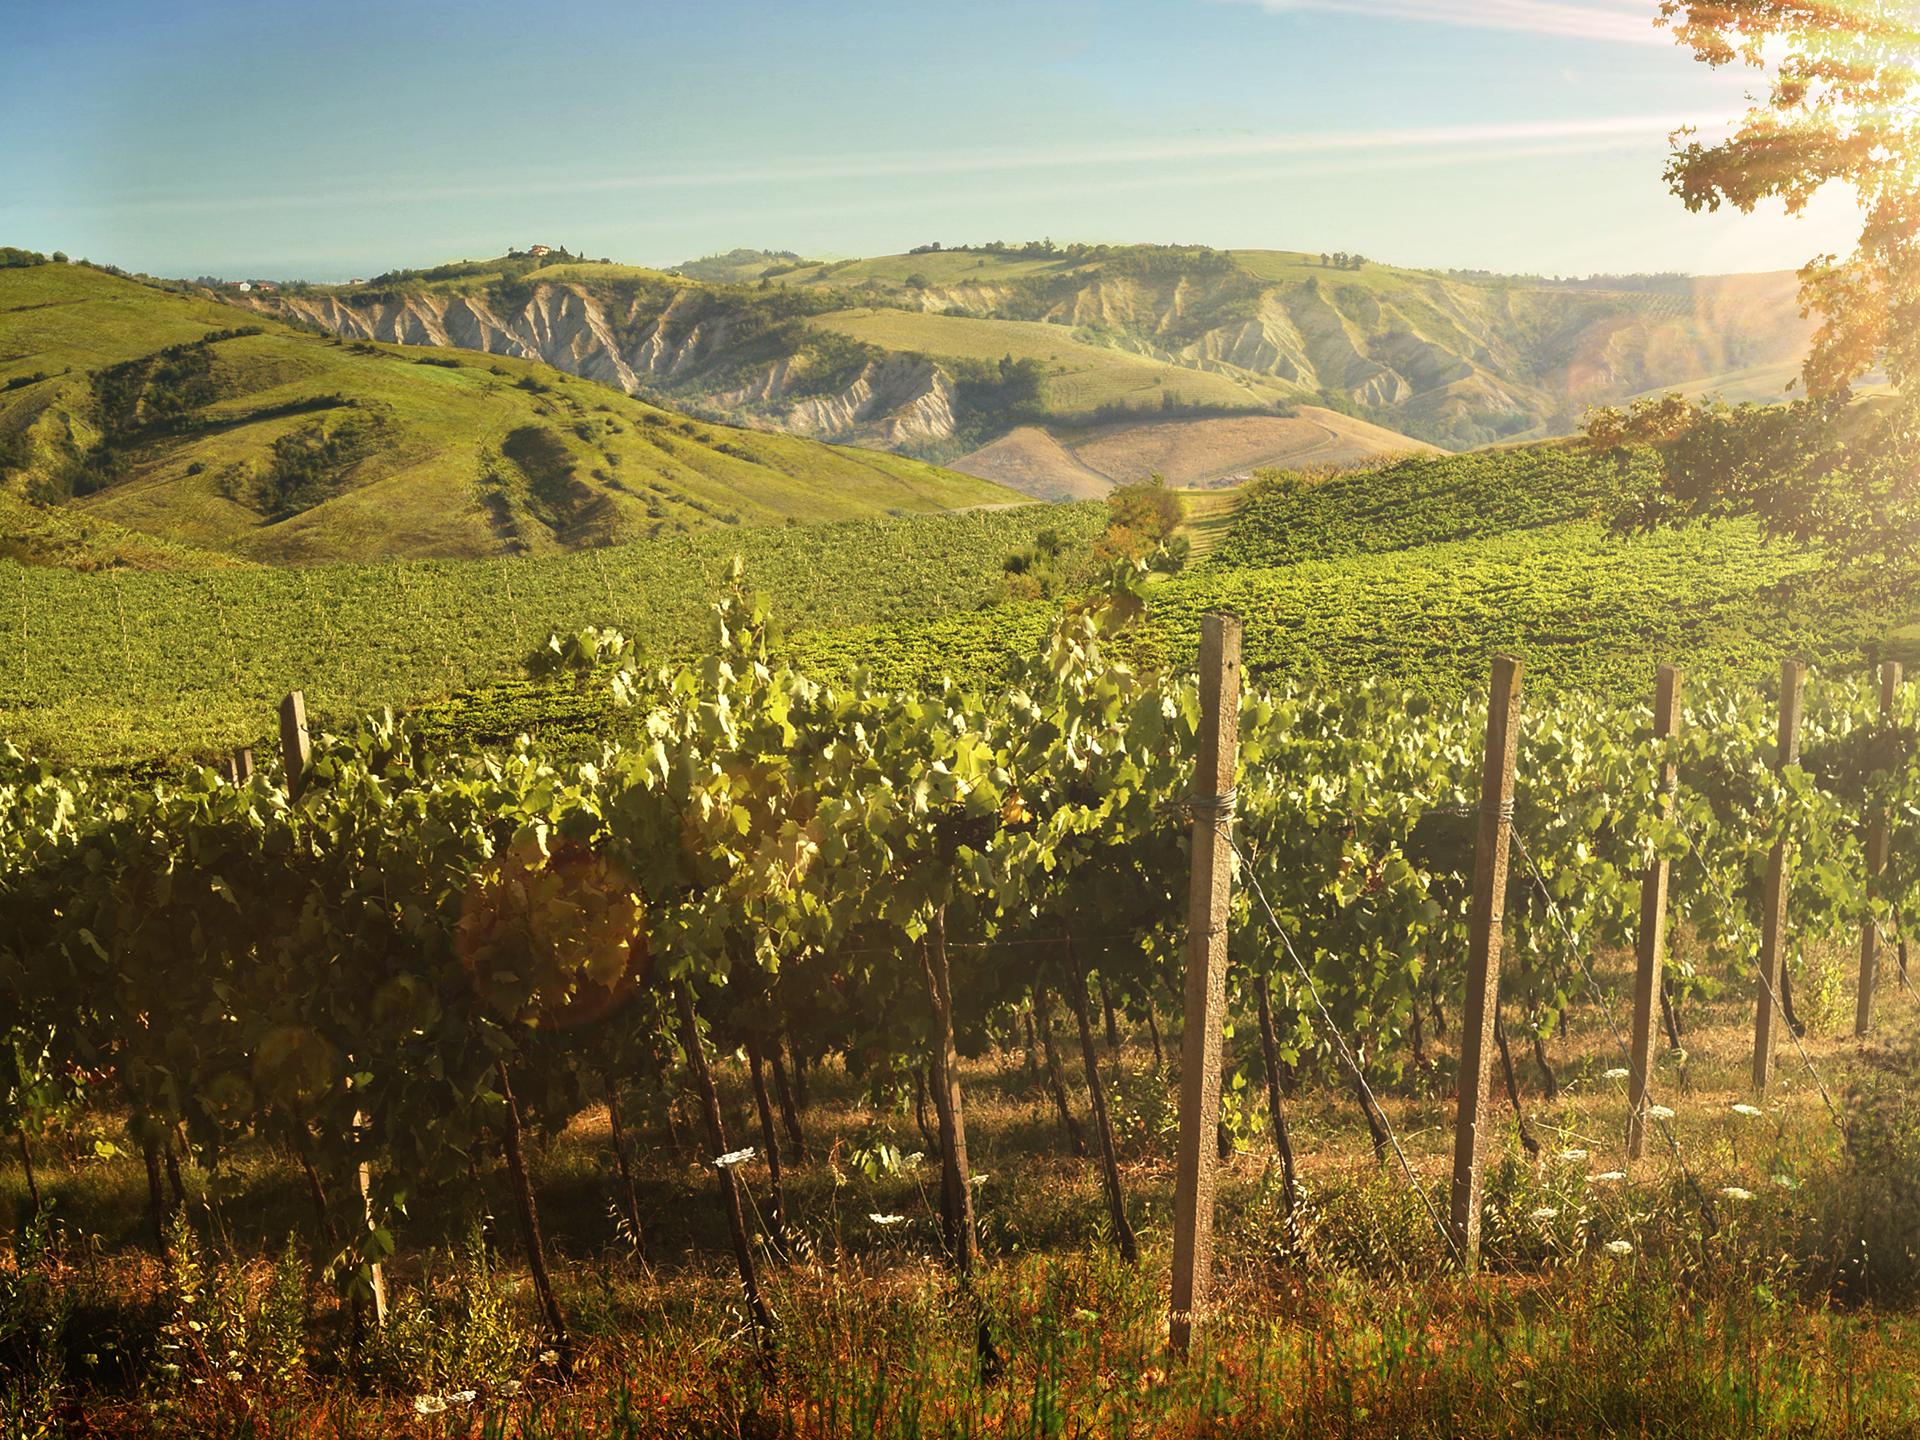 Guarini-Matteucci-vini-wine-Castelfalcino-Vigne-Panorama-.png